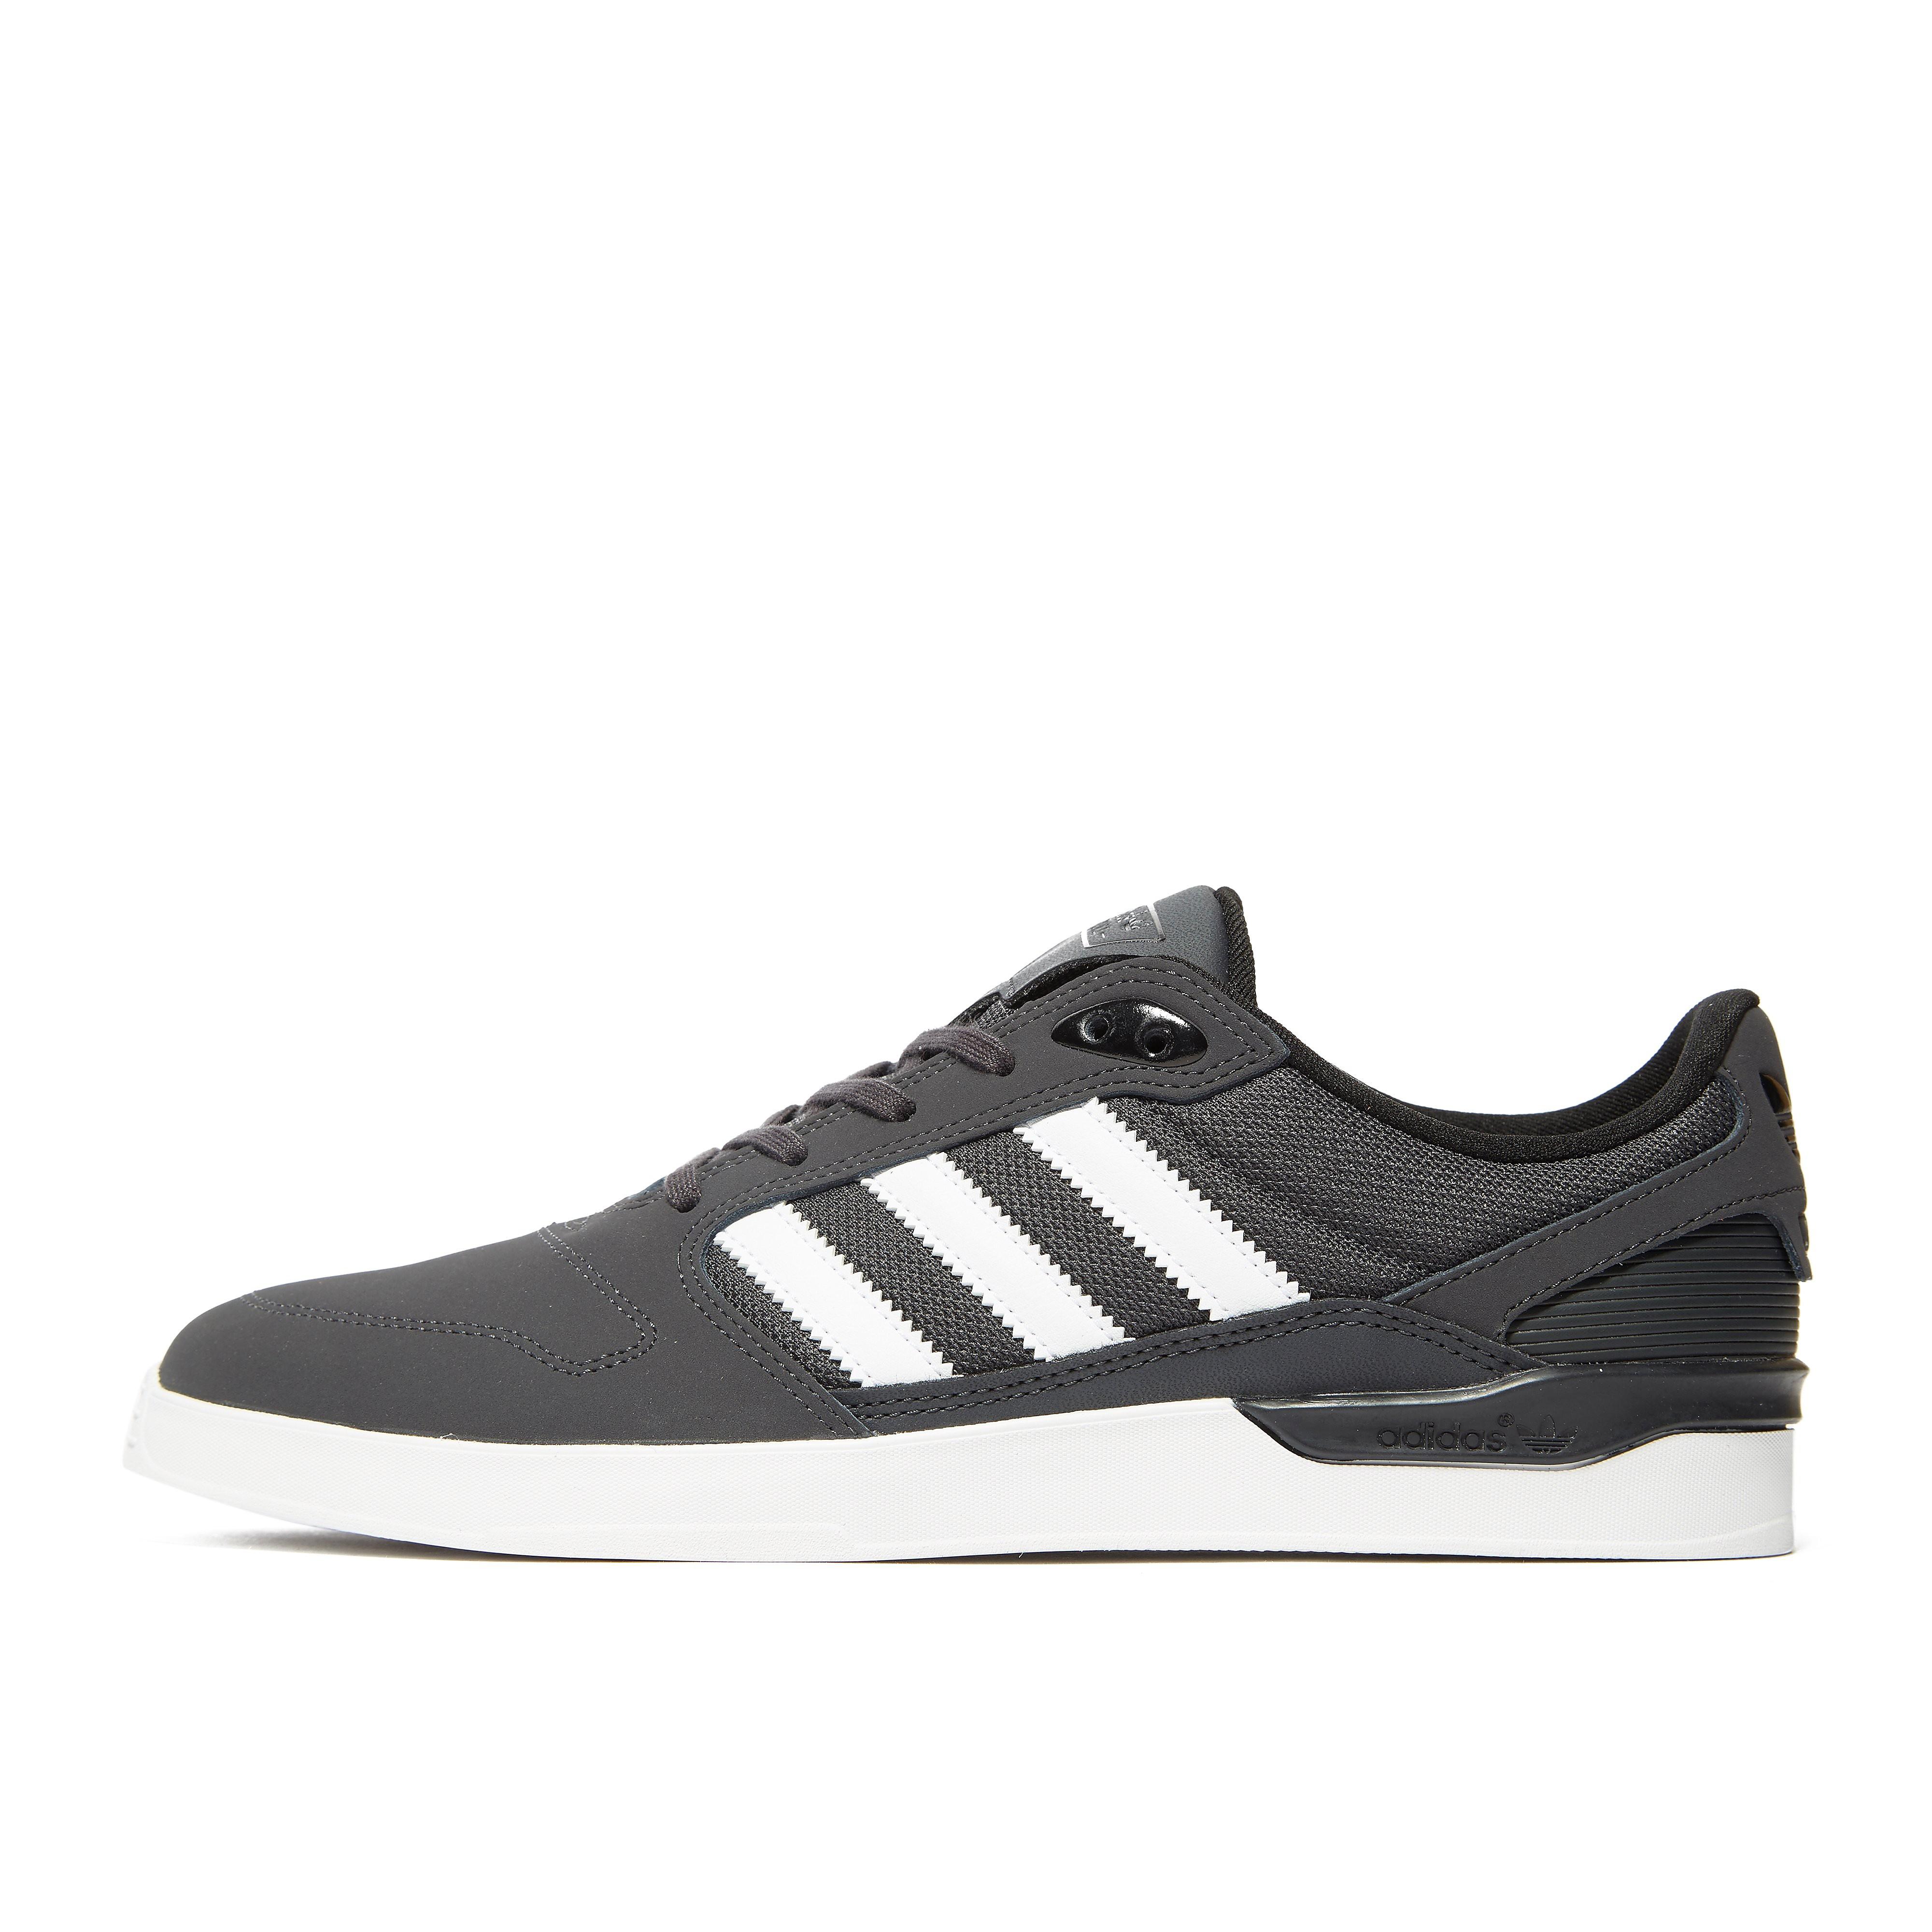 adidas Originals ZX Vulc Dunkel Grau-Weiß